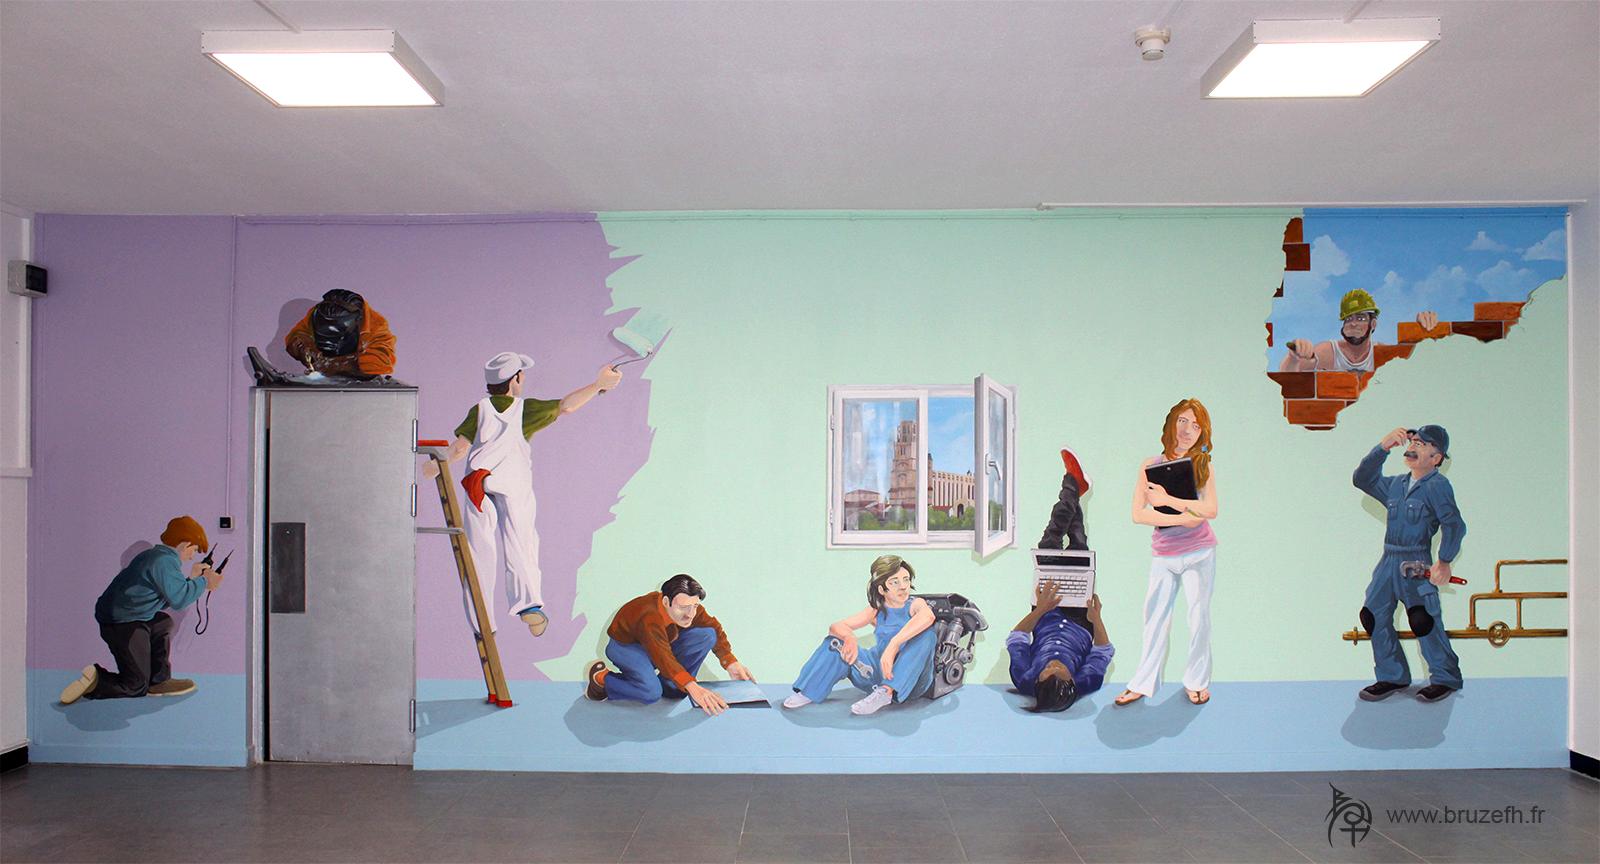 Peinture artistique murale, AFPA d'Albi